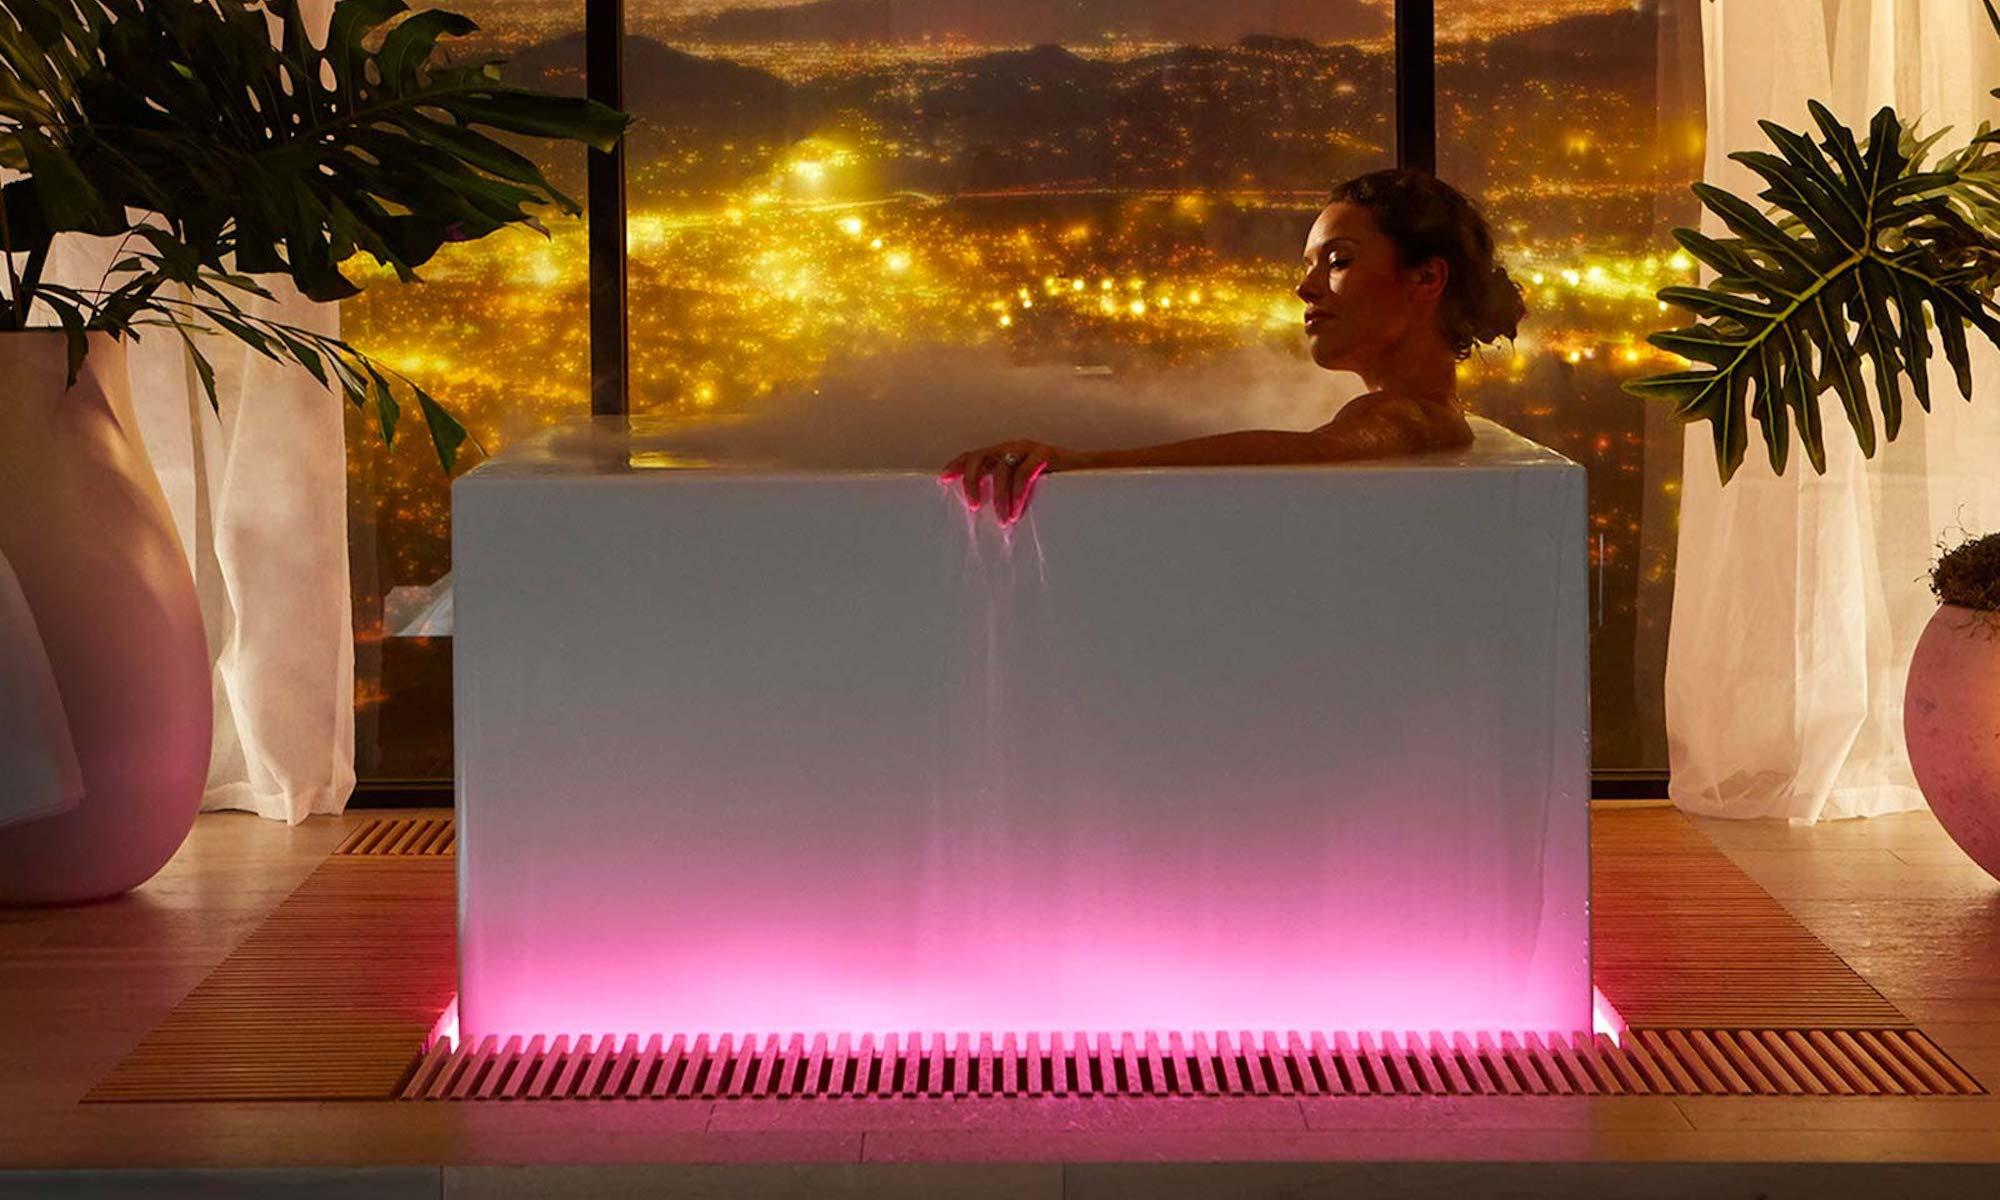 Kohler Stillness Bath creates a spa-like experience at home